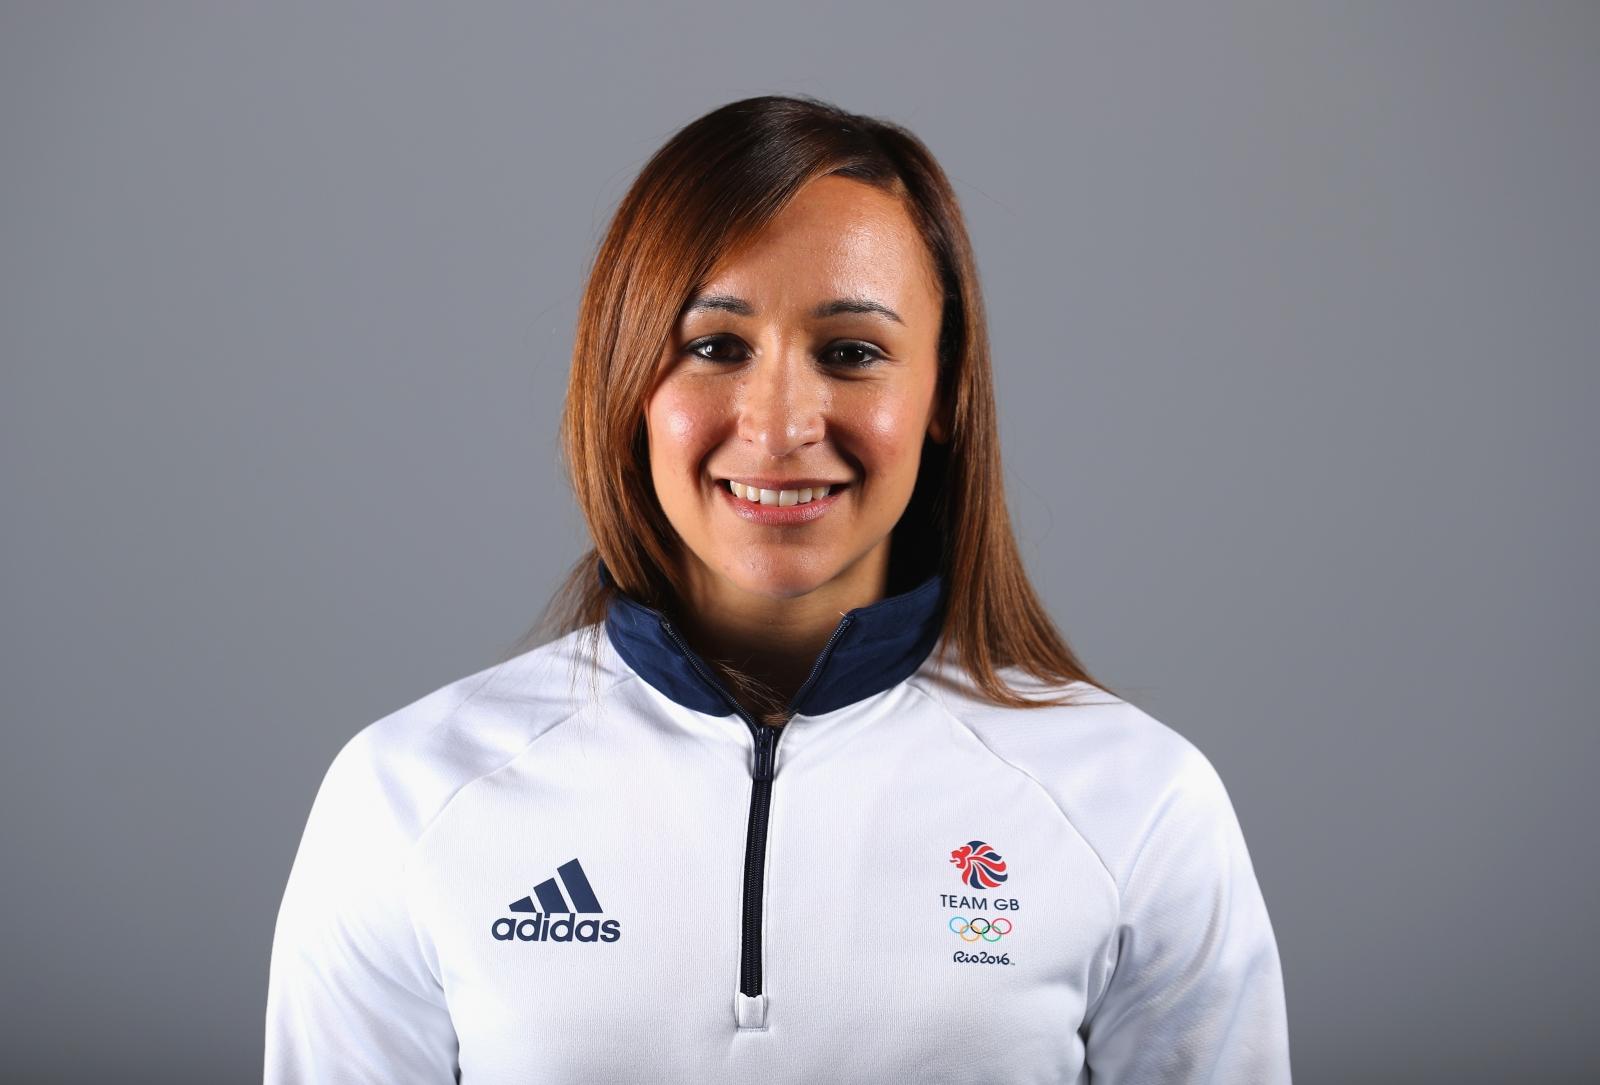 Jessica ennis uk olympic gold medal ass ameman - 1 part 10